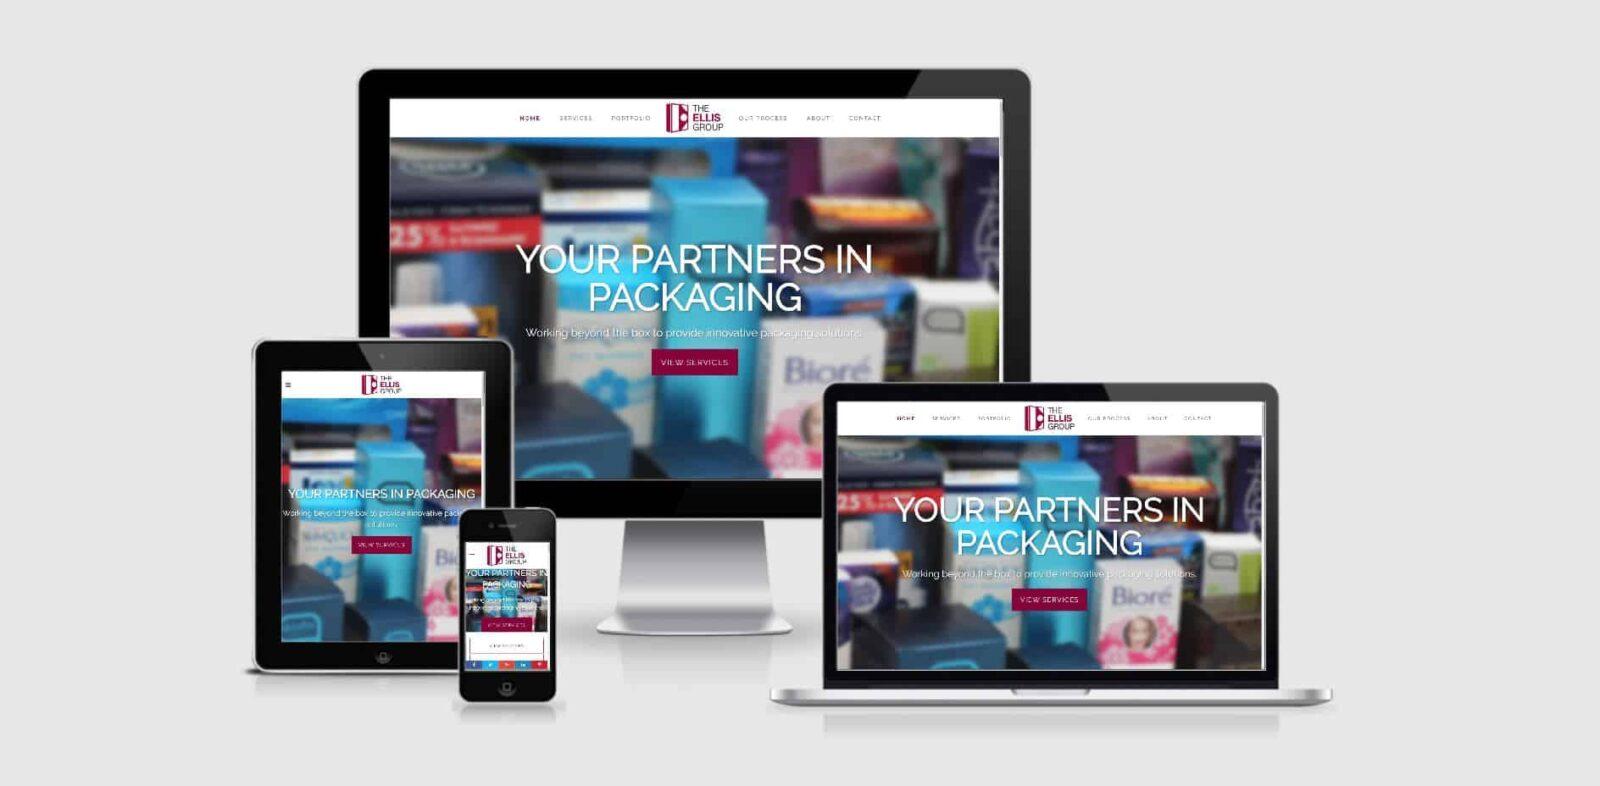 ellis website launch